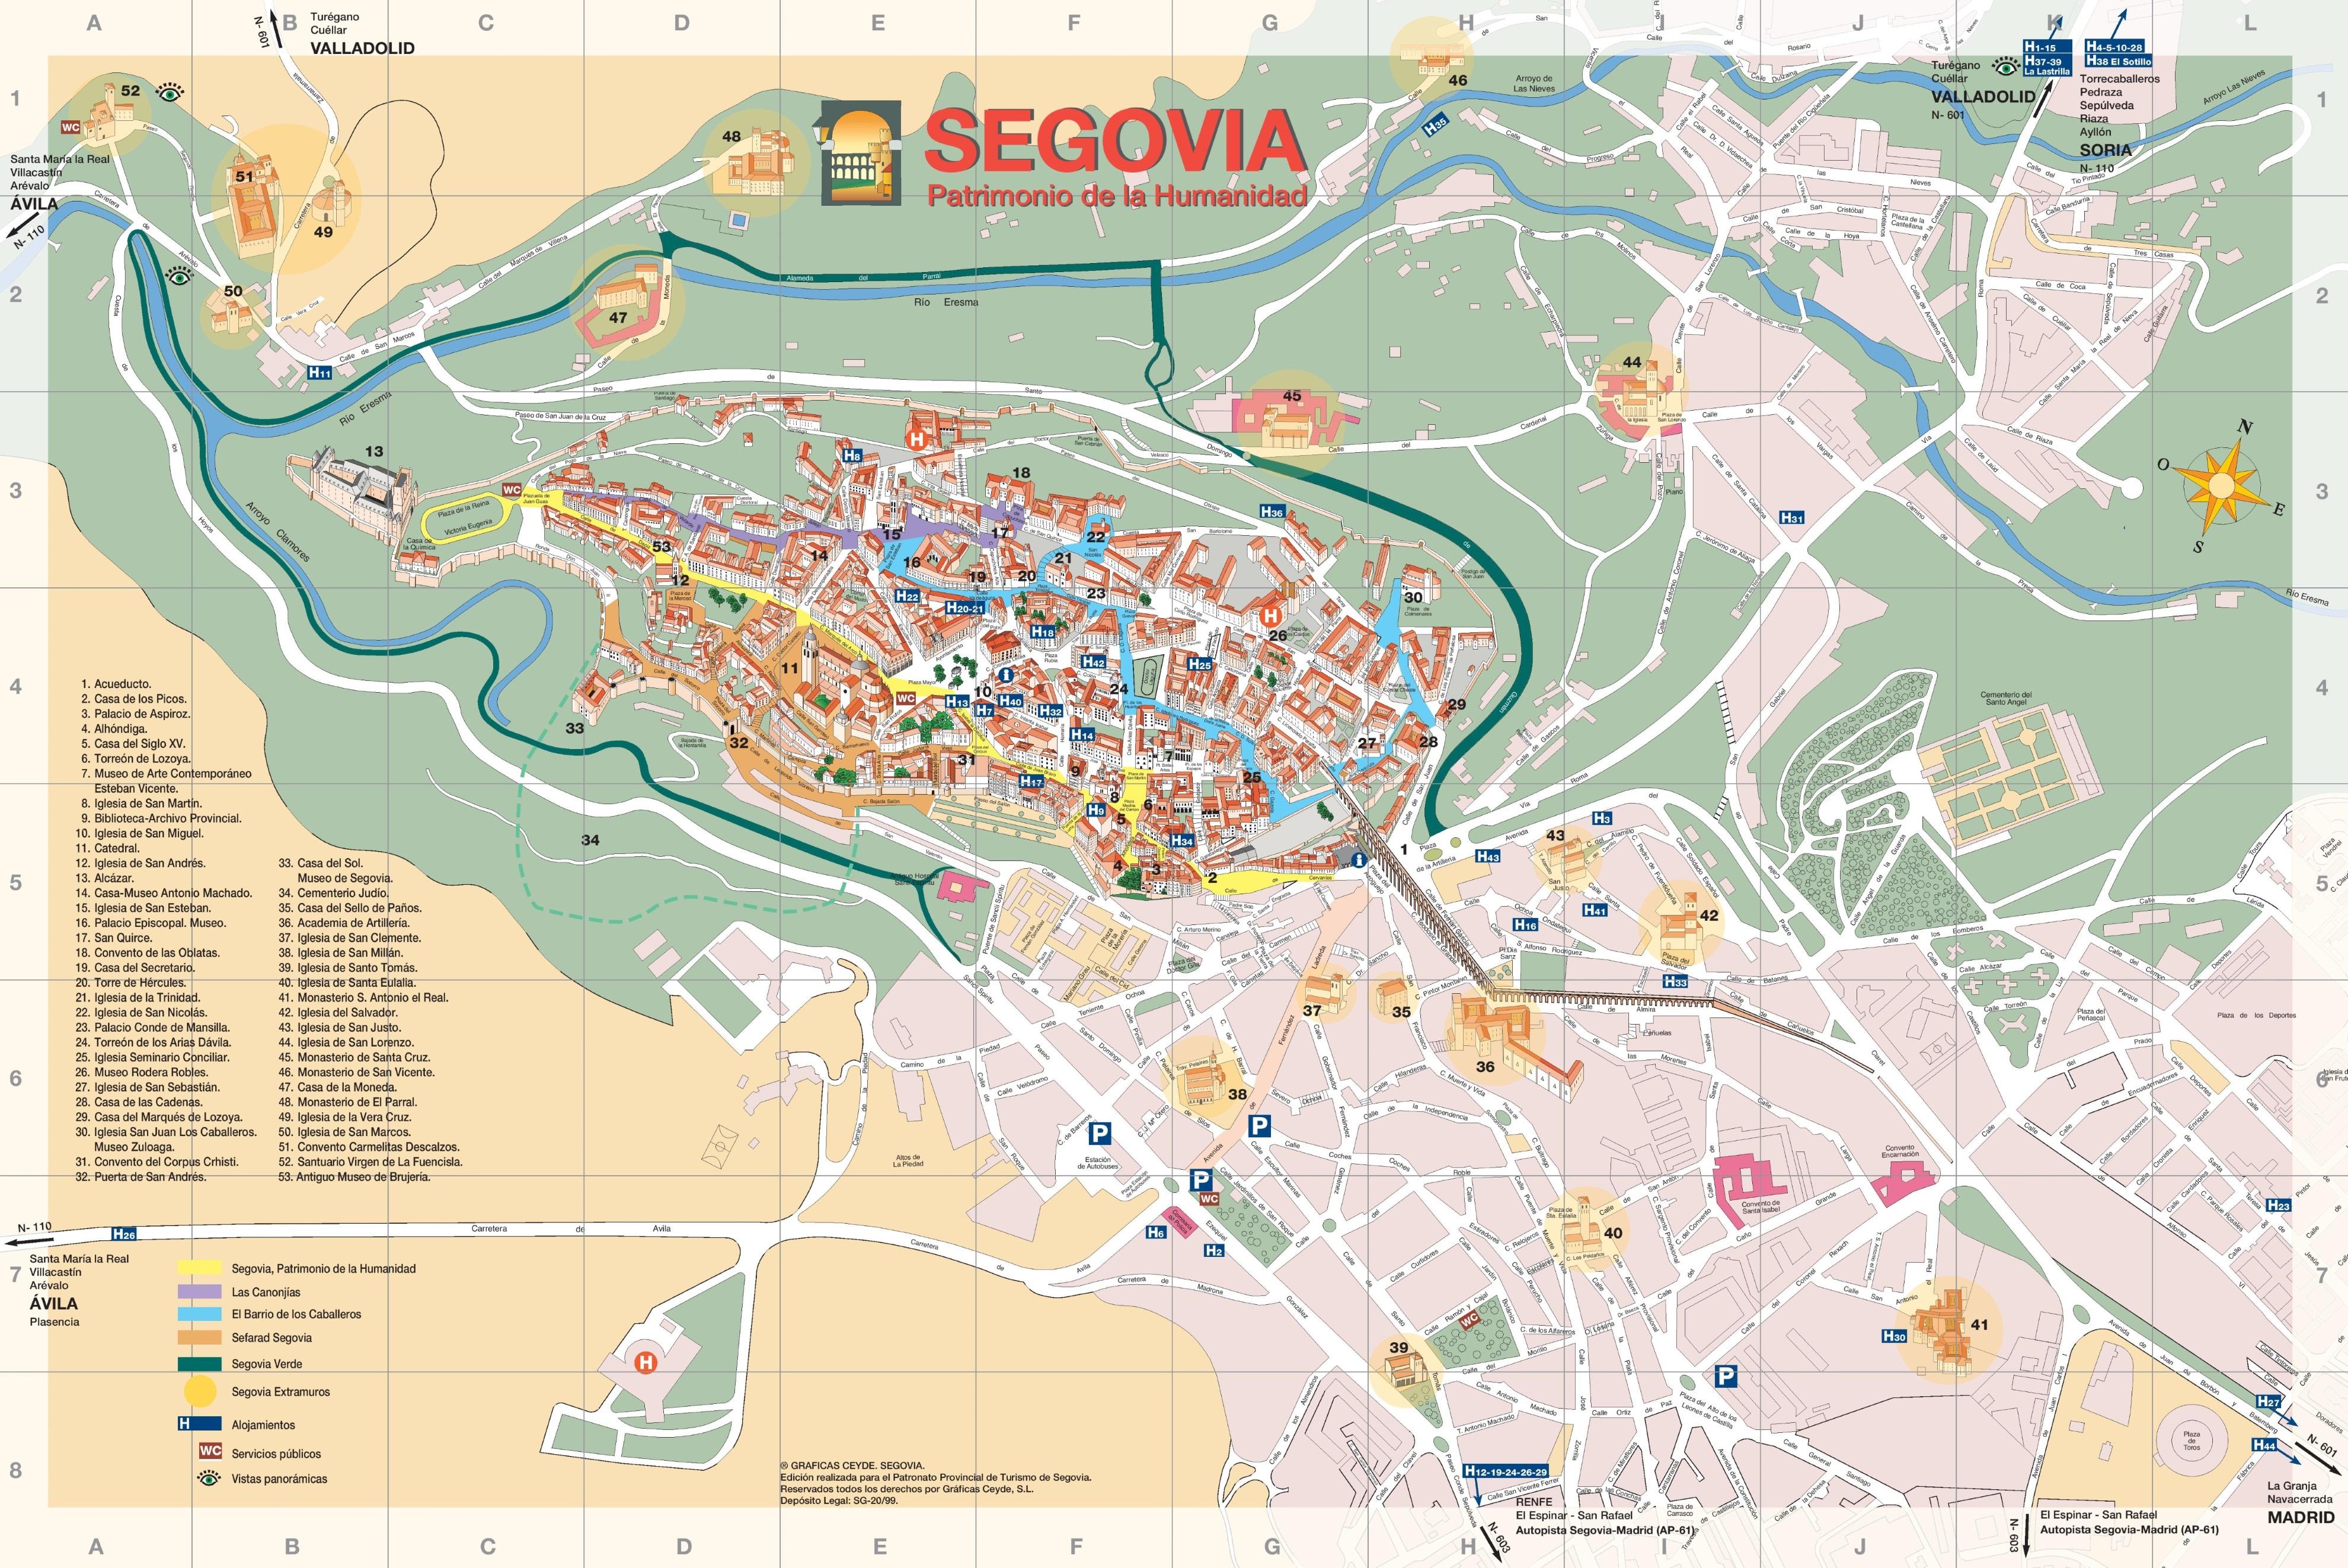 Segovia old city map